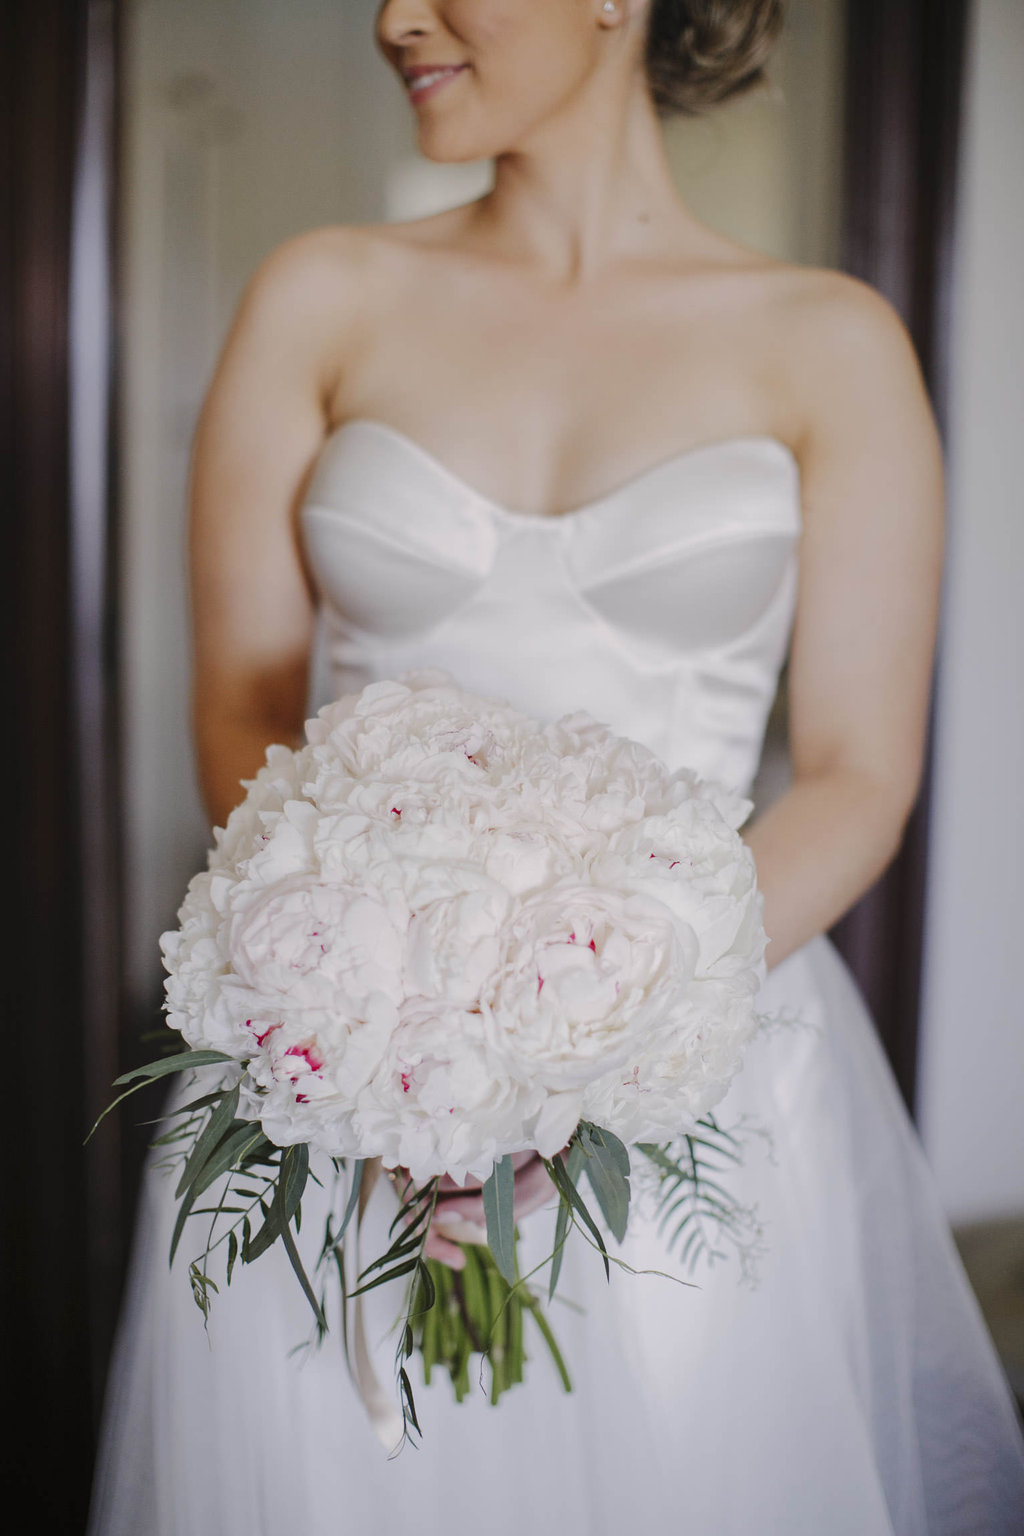 161106_justinaaron_wedding_fraiah_shaun_pr-13.jpg